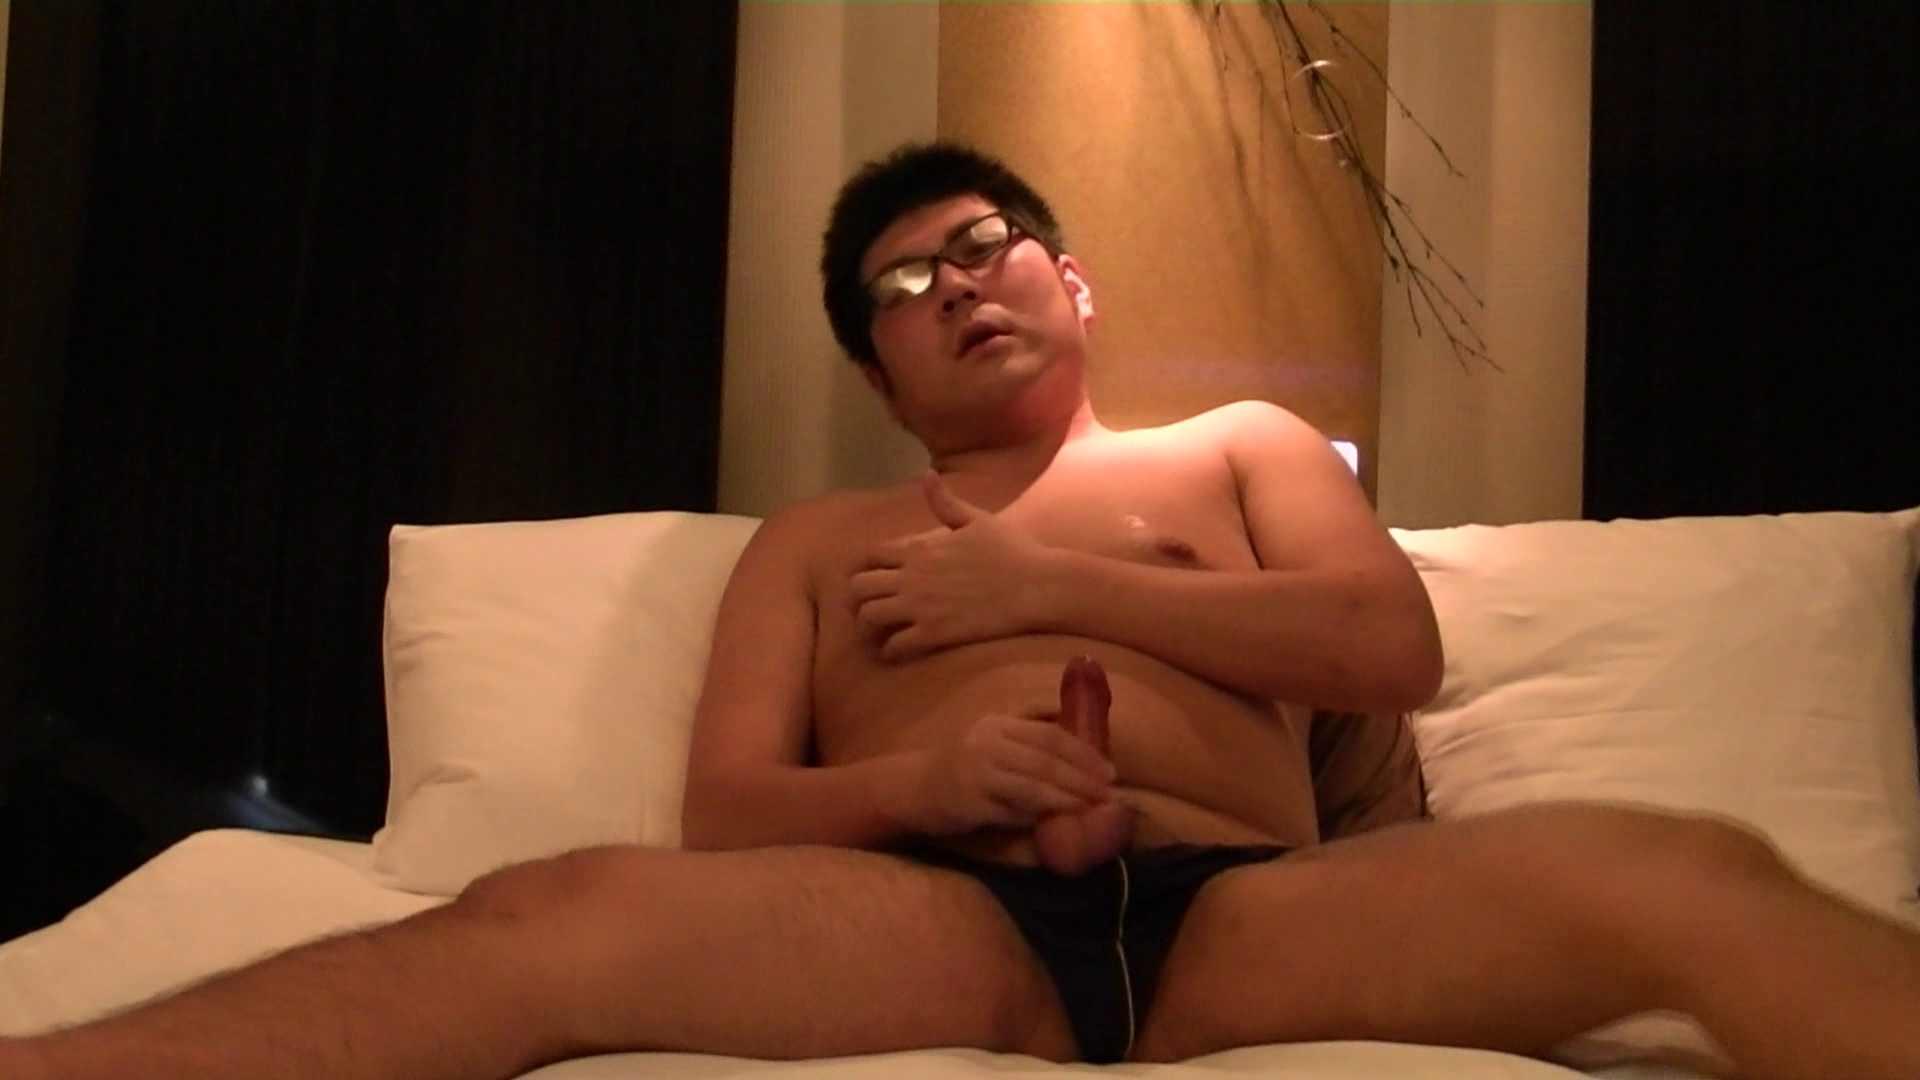 Mr.オナックスさん投稿!HD 貴方のオナニー三万円で撮影させてください。VOL.02 前編 念願の完全無修正 ゲイ無料エロ画像 105連発 72